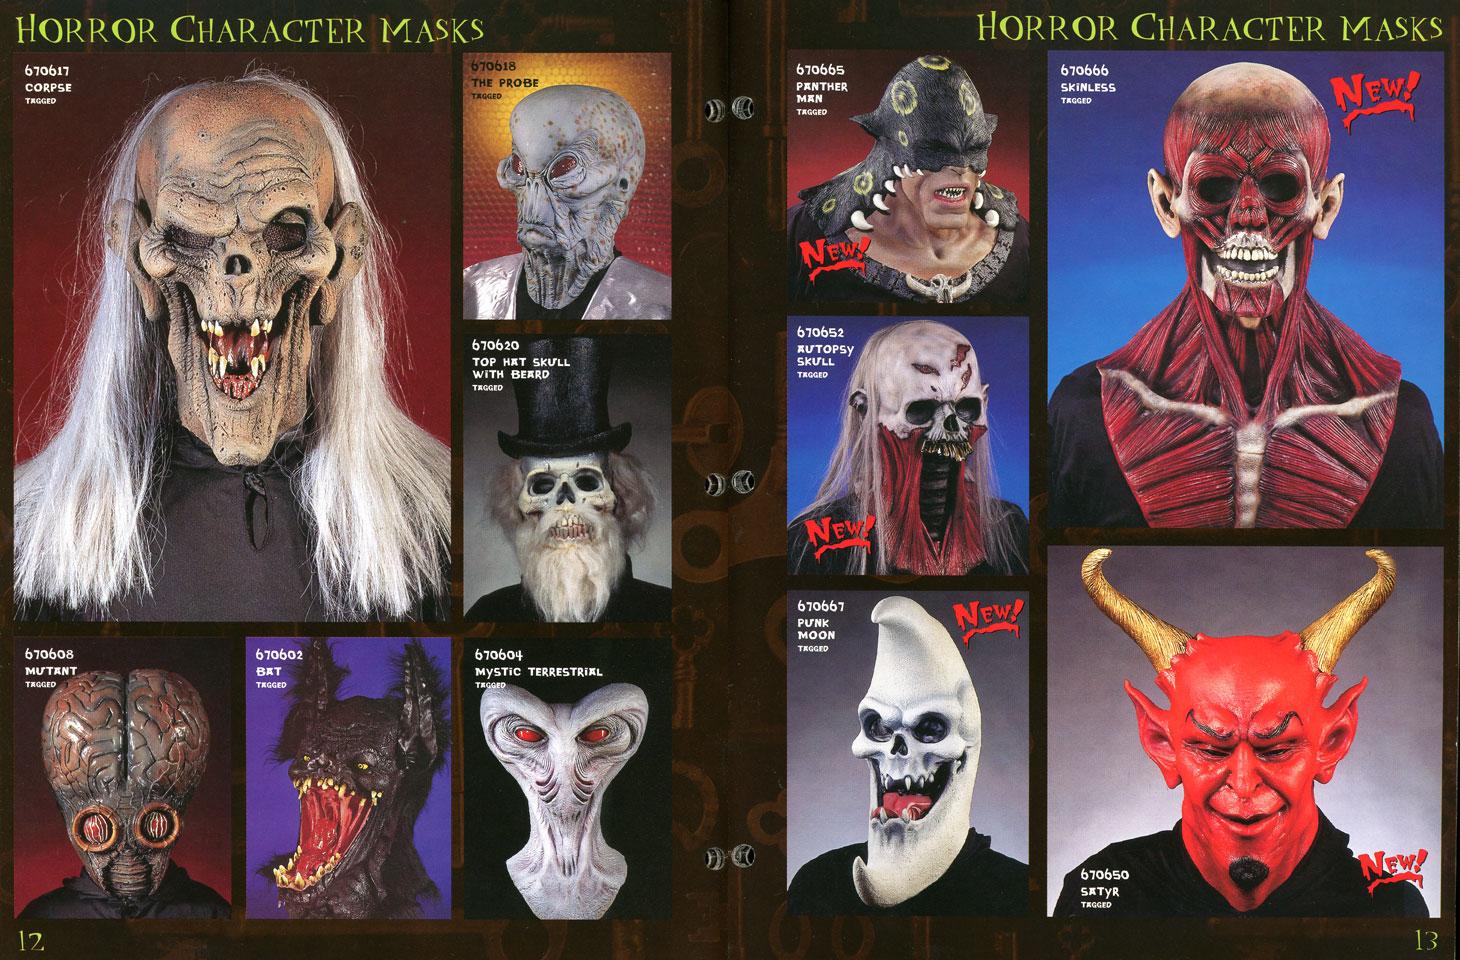 Masks gone batty